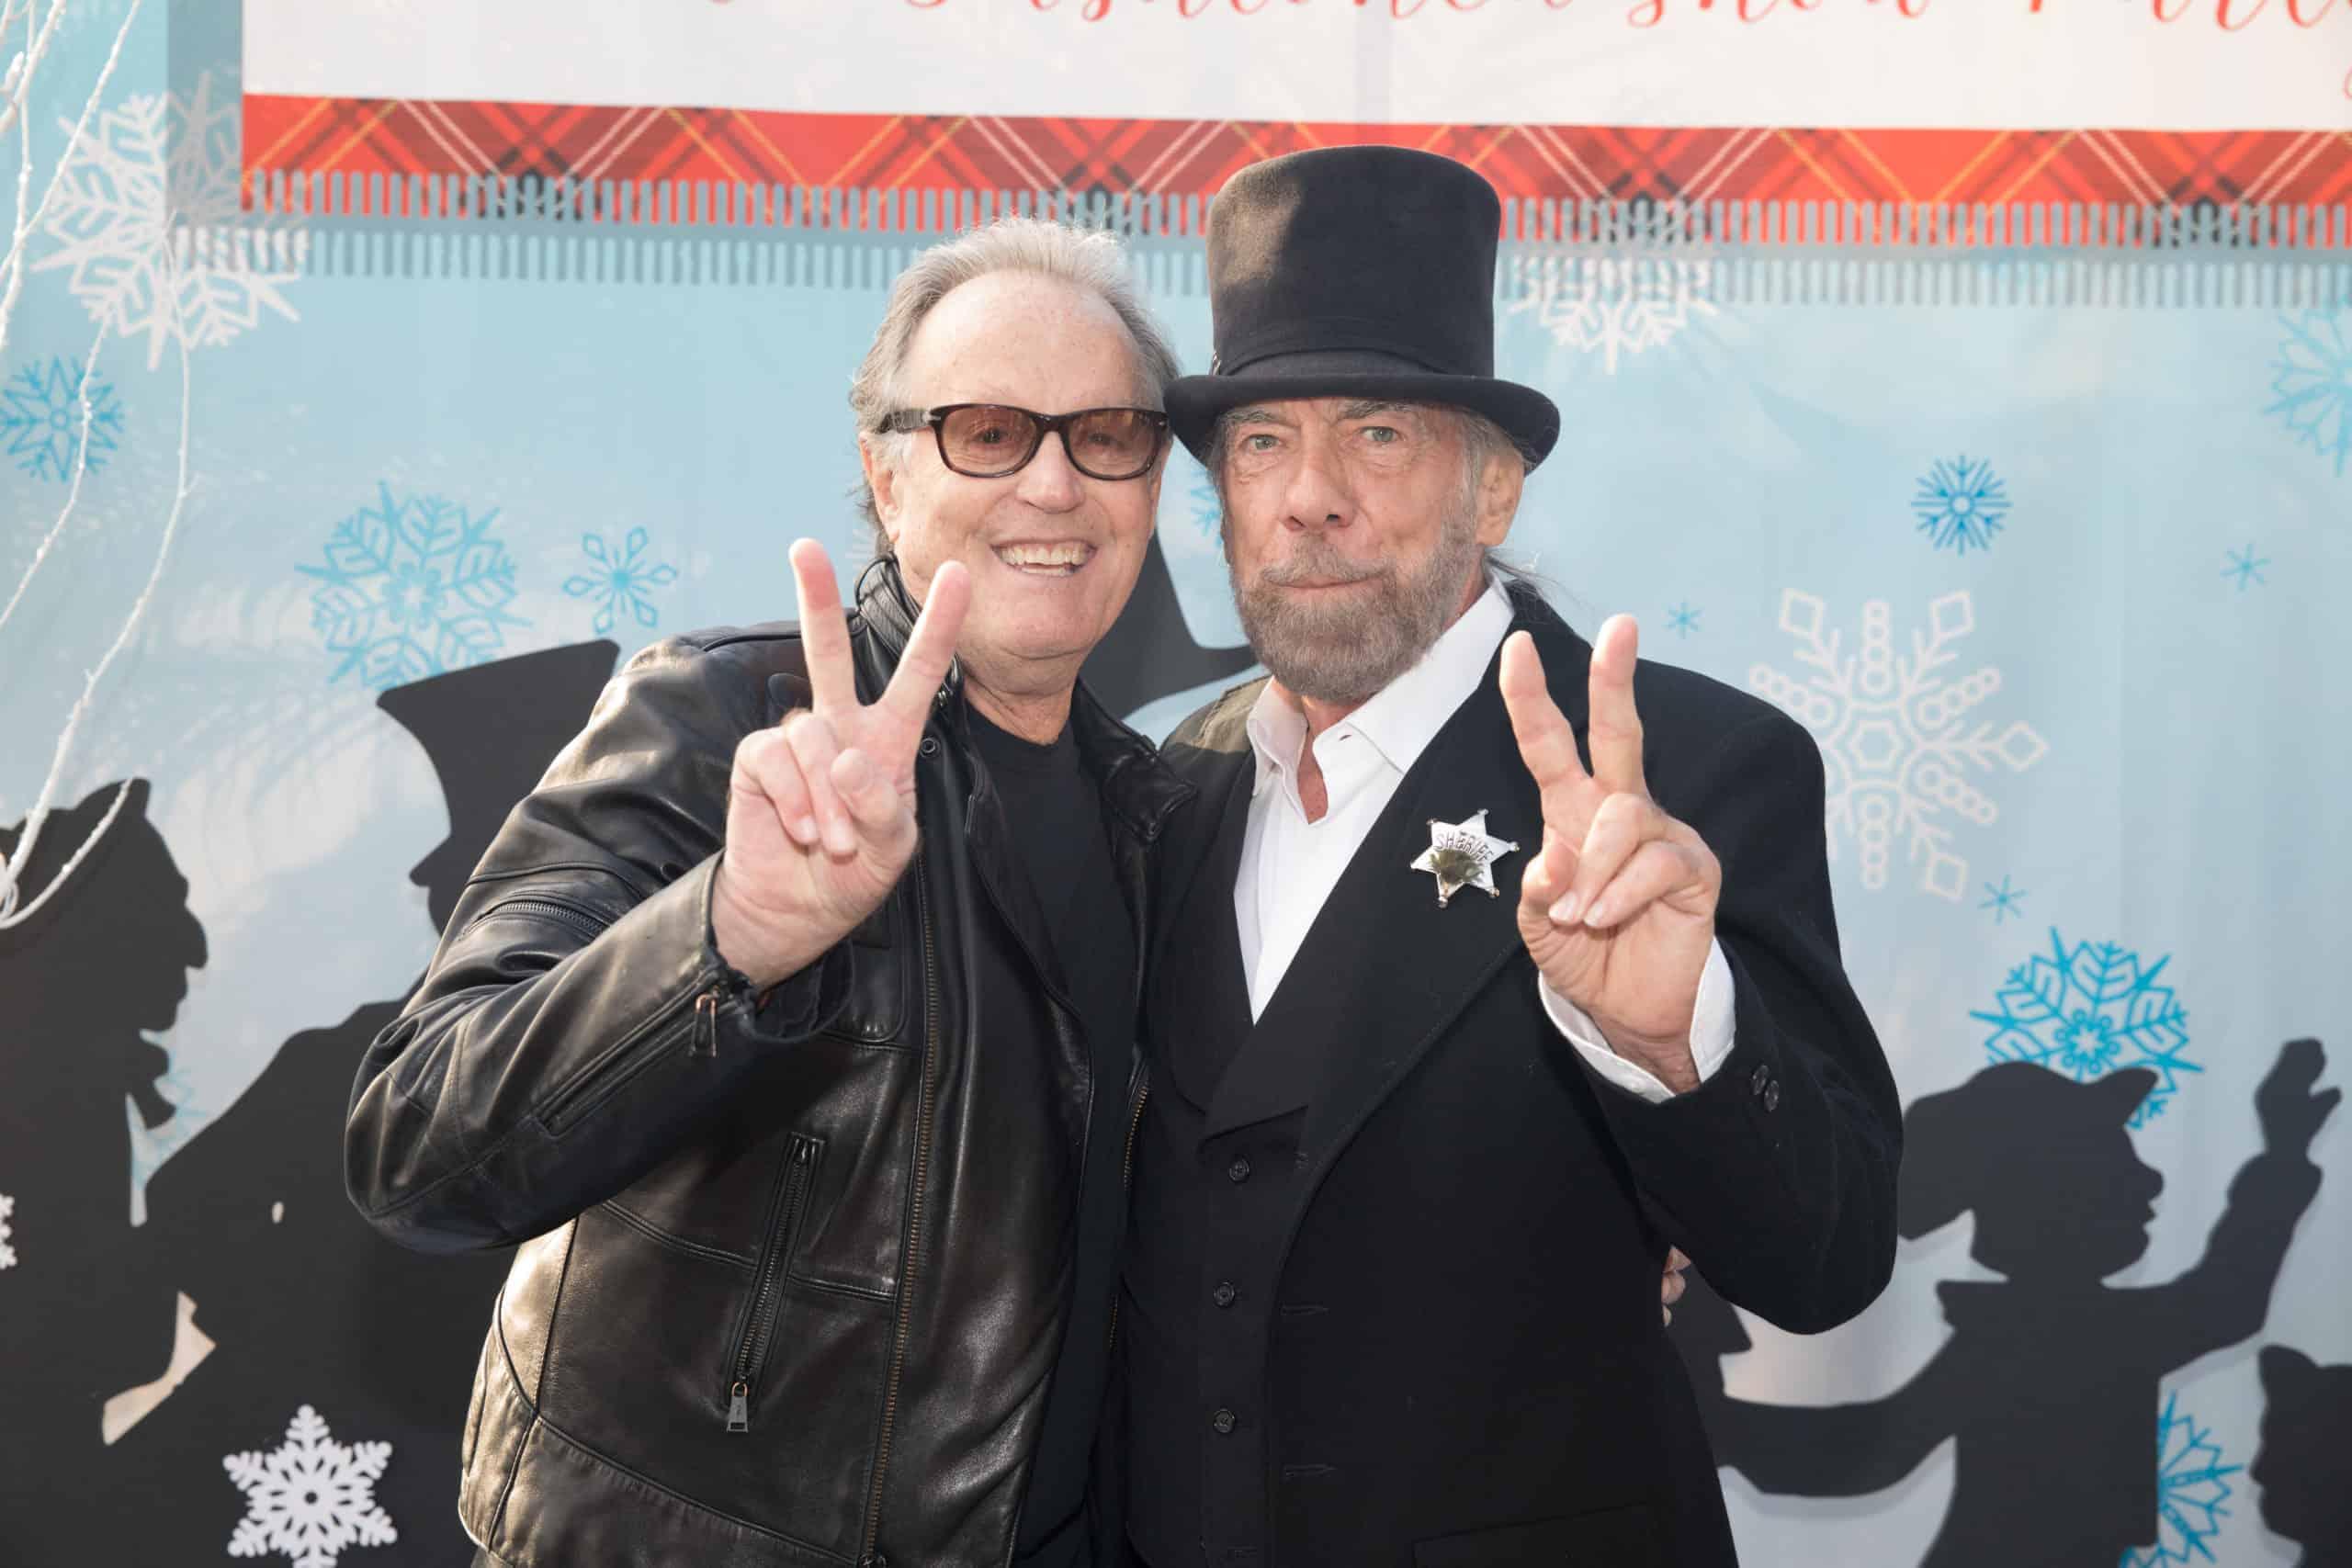 Peter Fonda and John Paul DeJoria